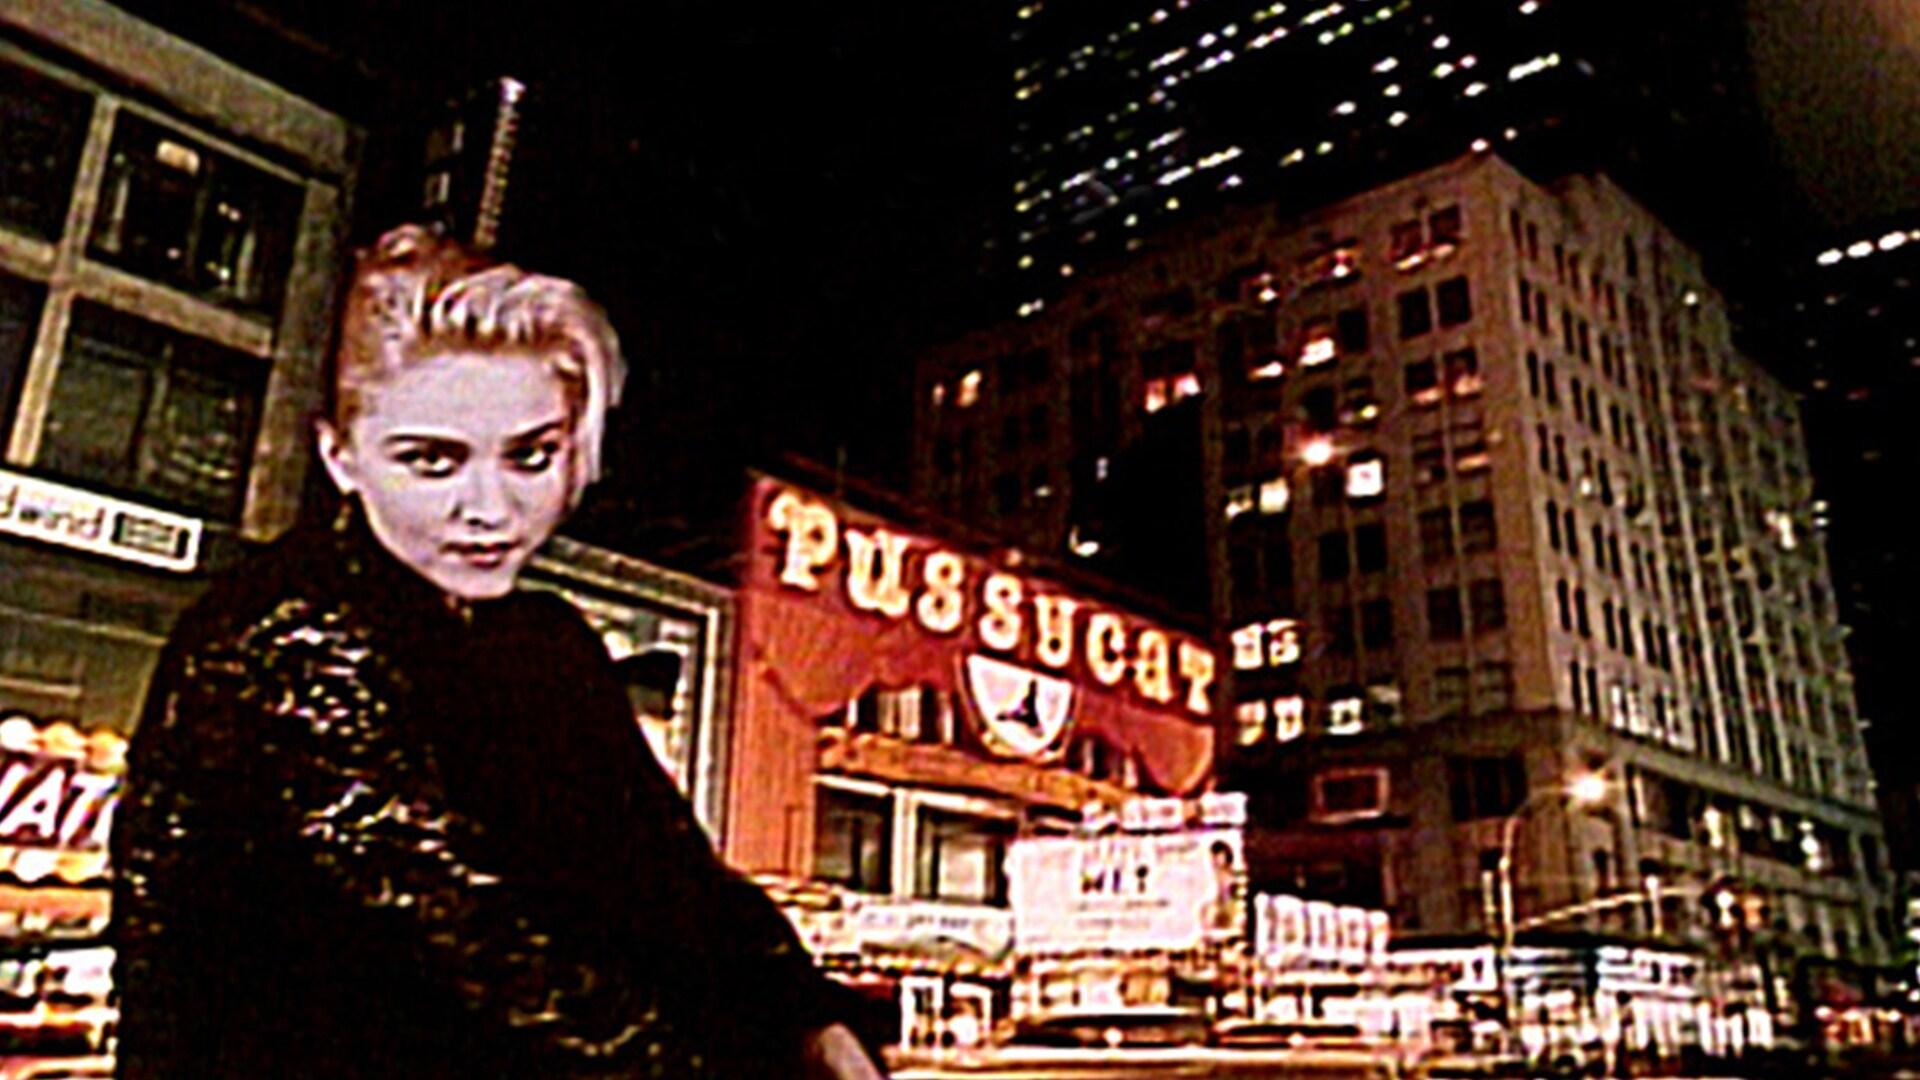 Madonna: November 9, 1985